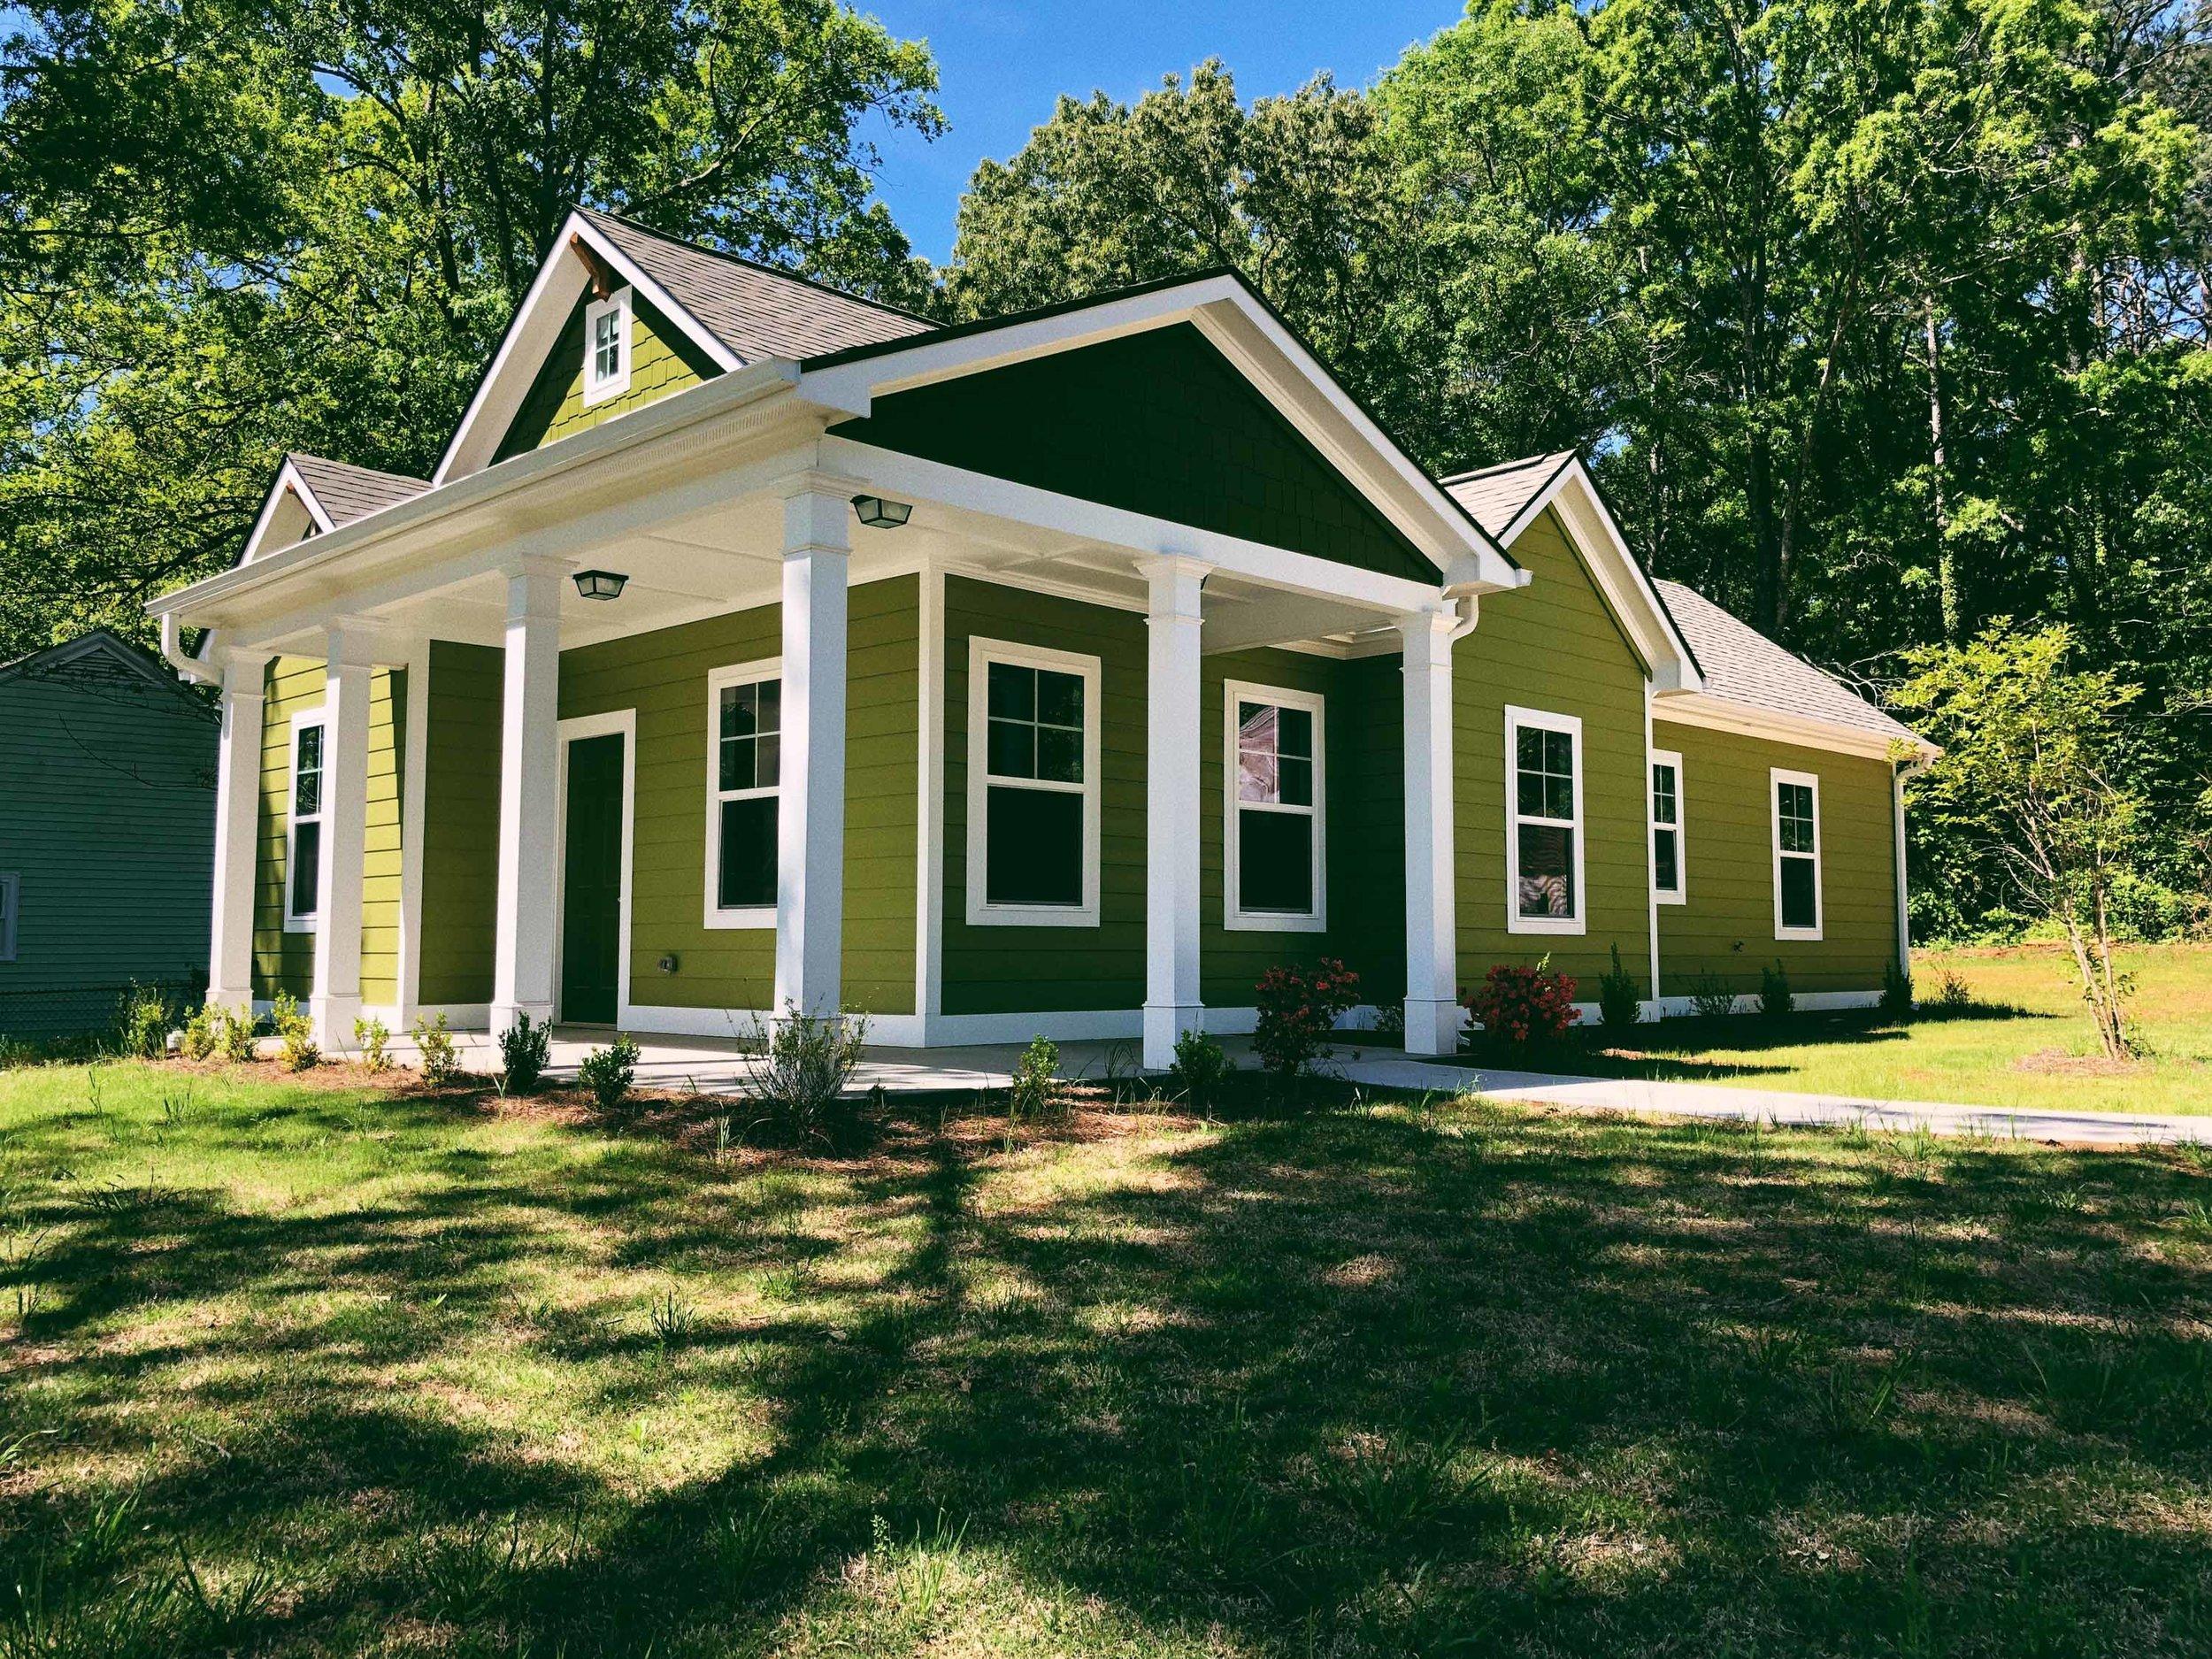 GHRA_Homeownership-9.jpg